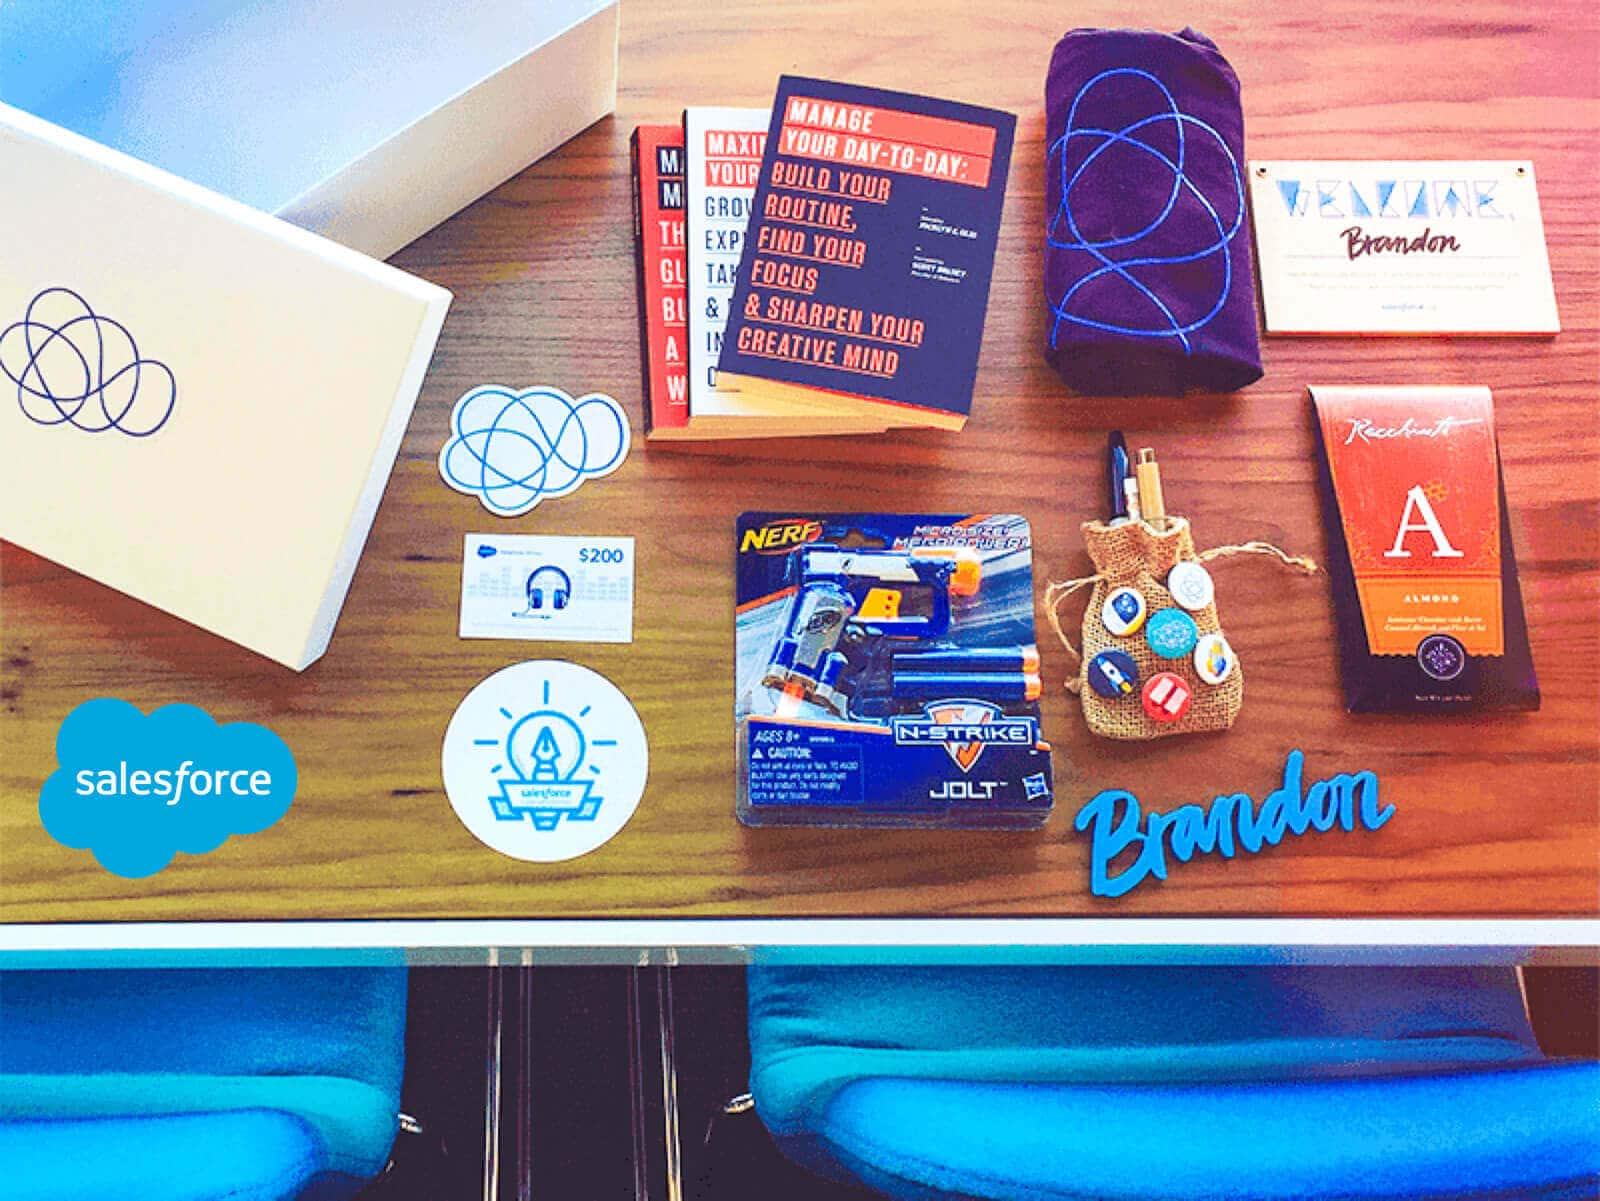 salesforce-new-employee-welcome-kit